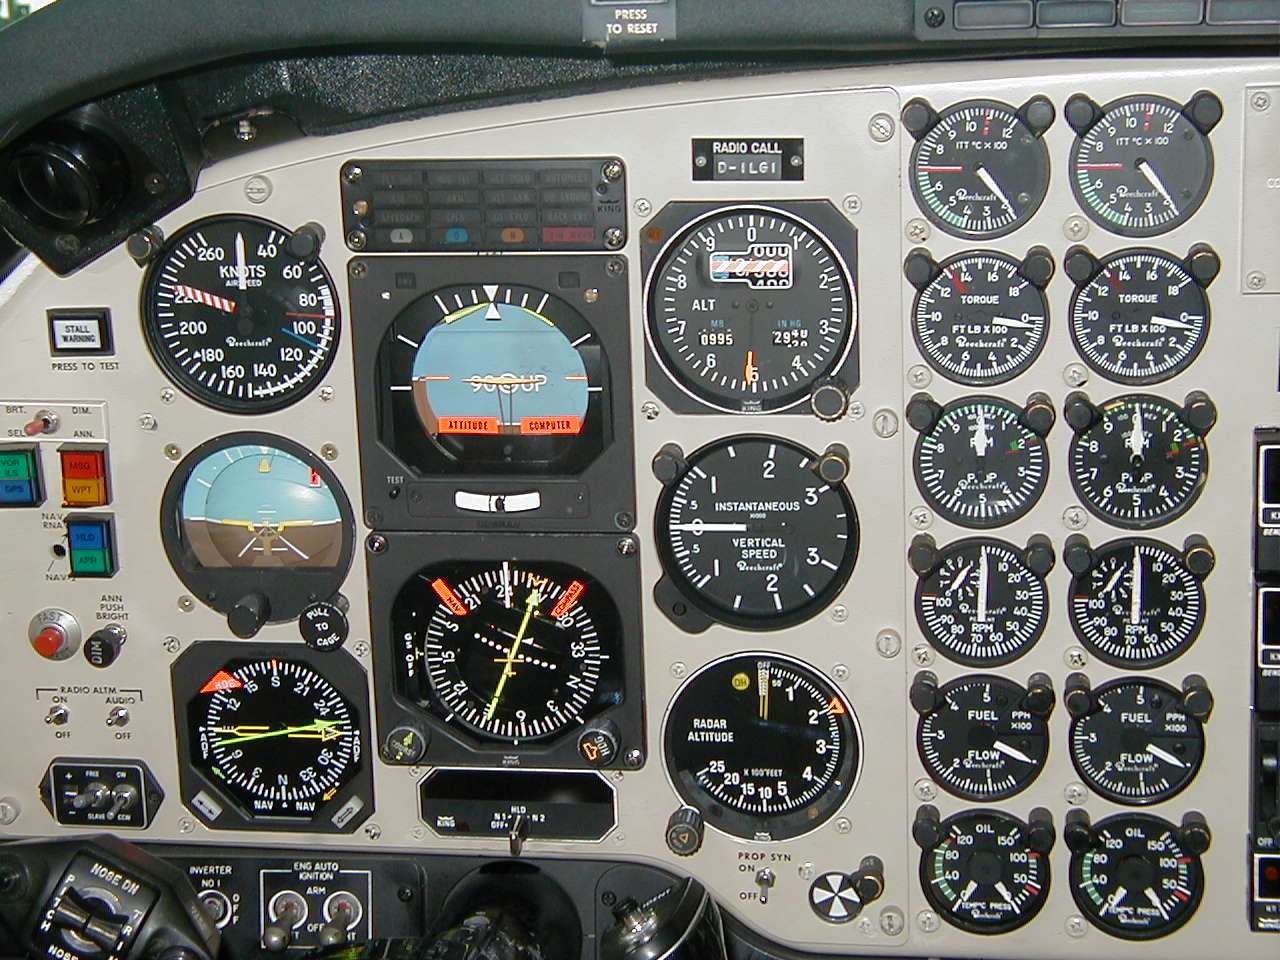 Cockpit Instrument Panel : Analog digital and configural displays in hci no fine